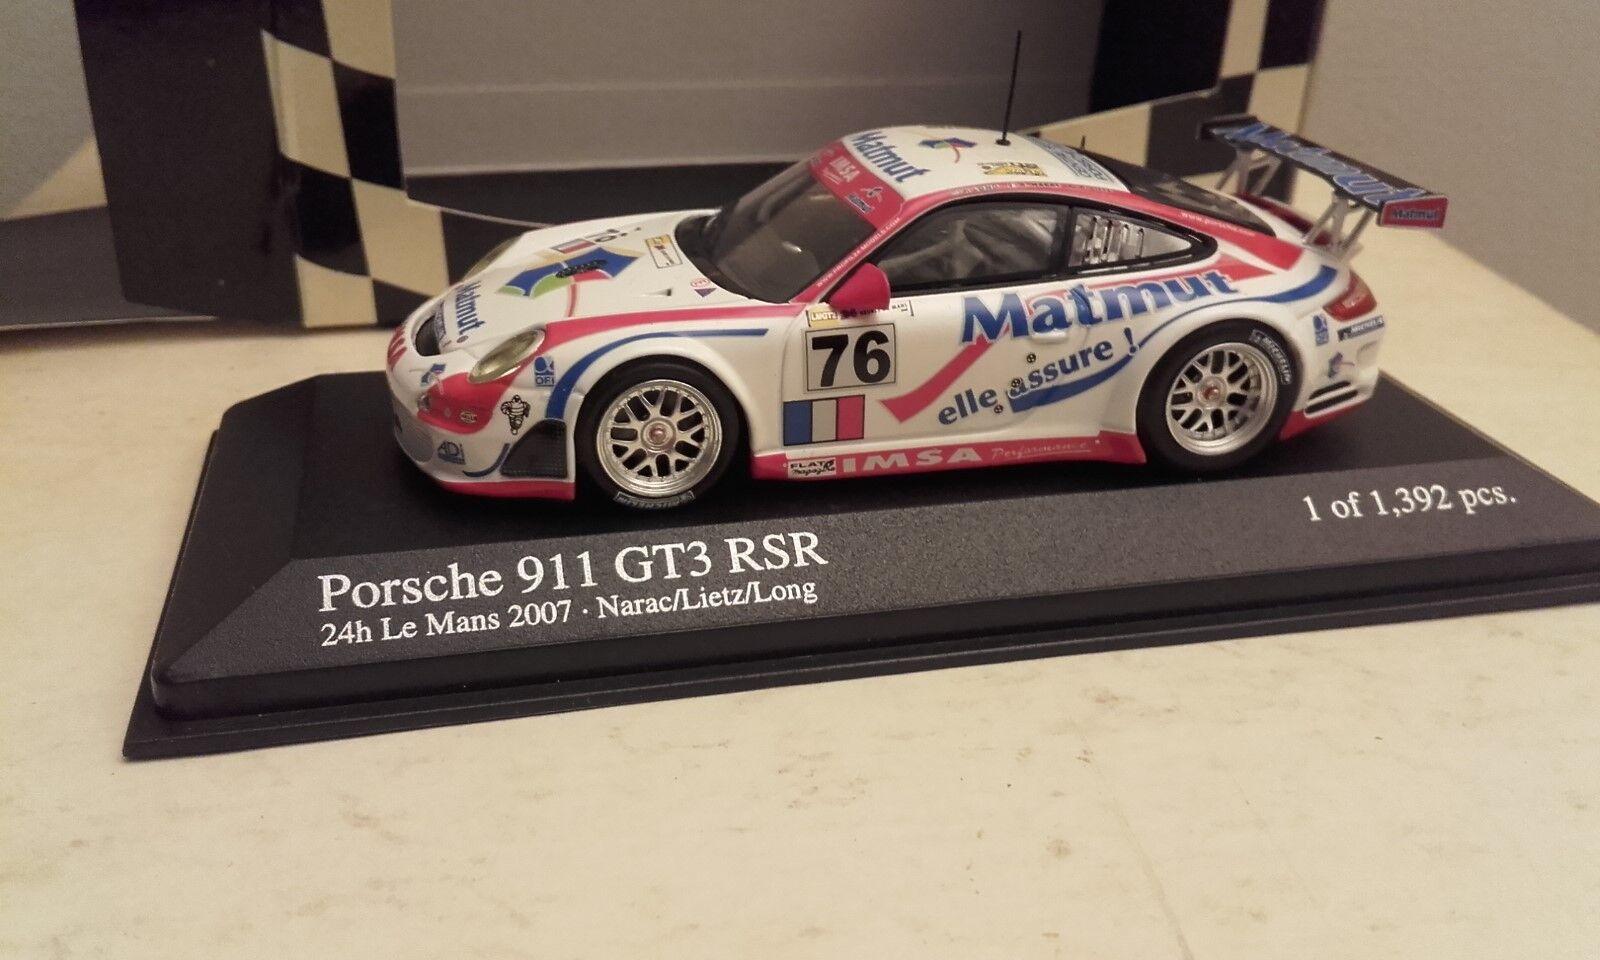 PORSCHE 911 GT3 RSR 24 heures du mans 2007 minichamps